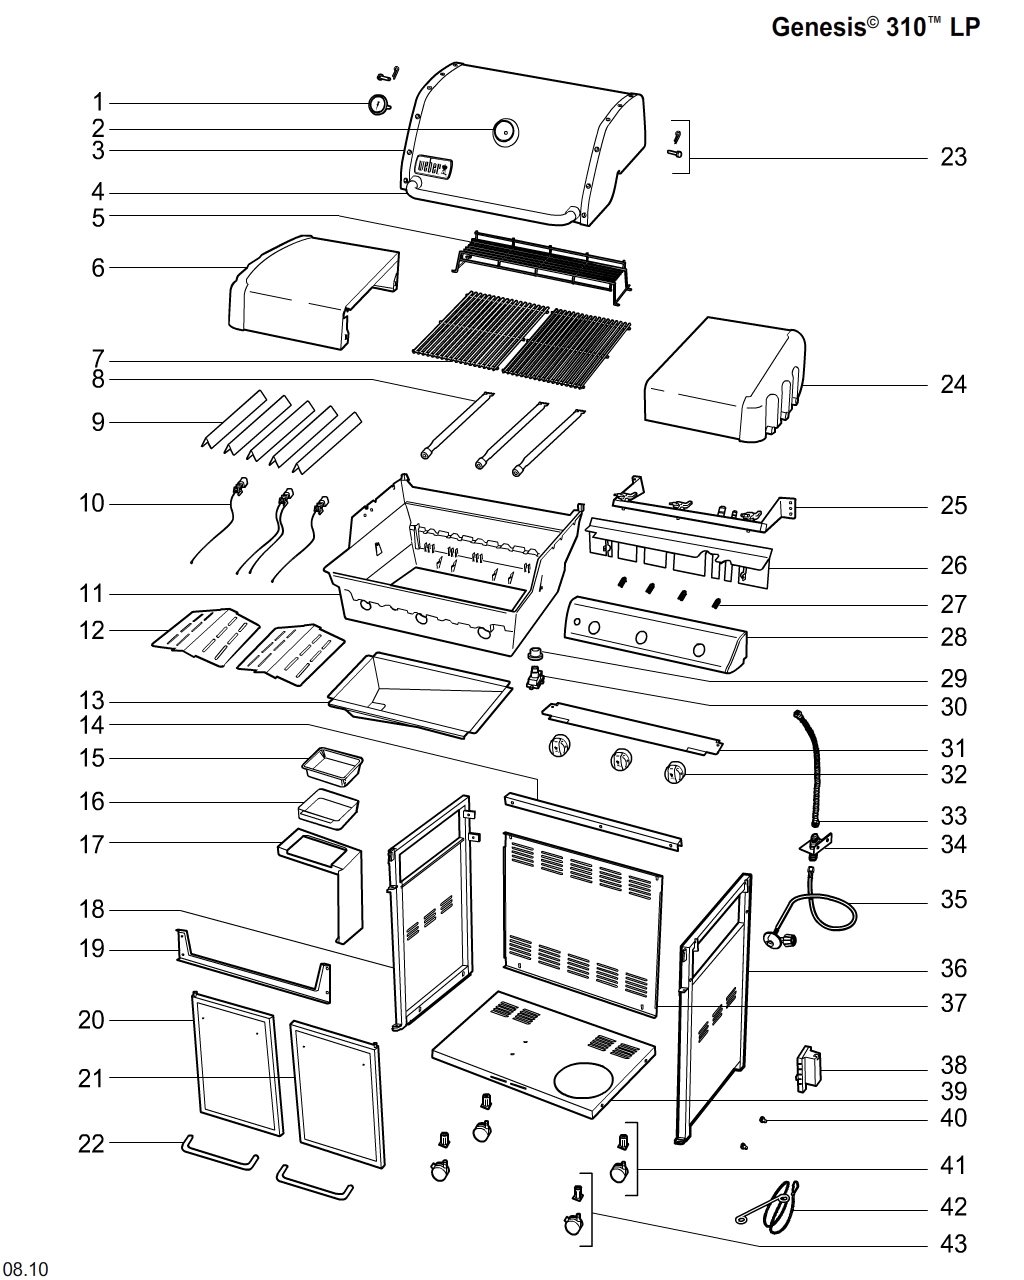 Schematic Image 6511001